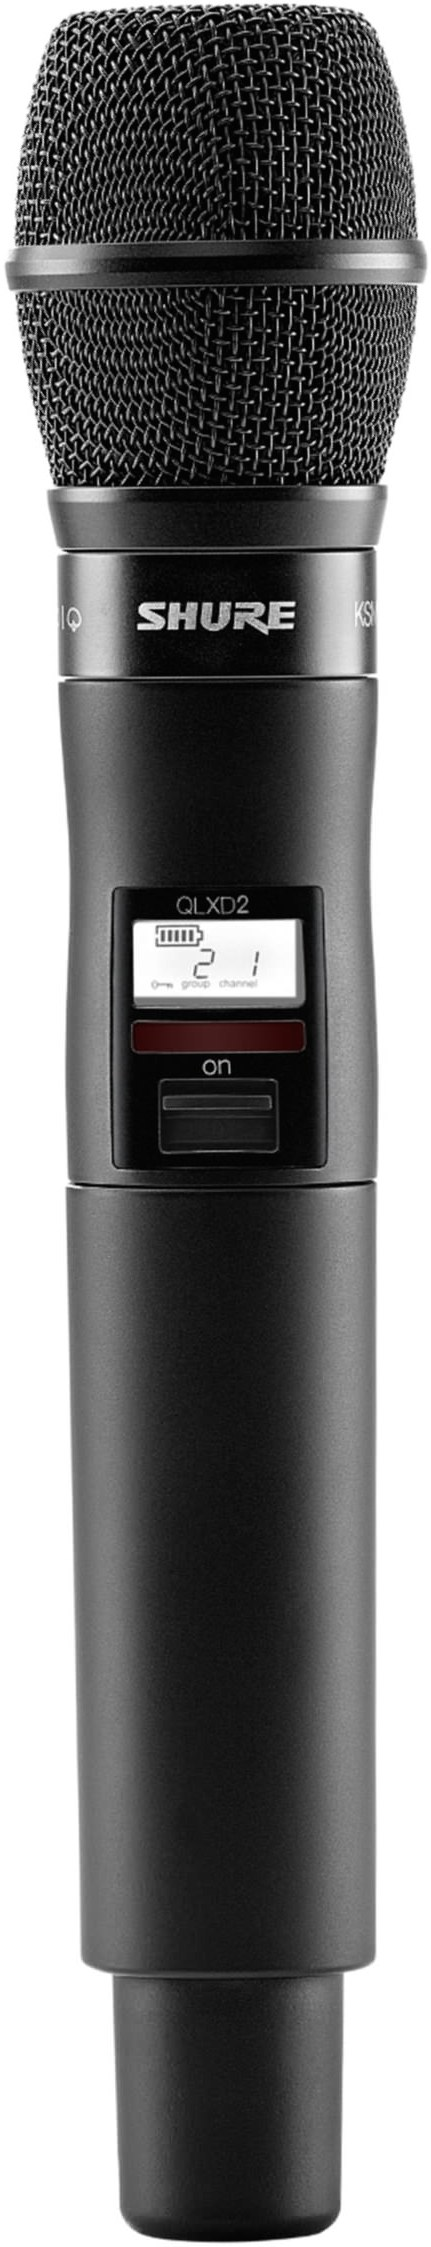 Цифровая радиосистема Shure QLXD2/KSM9 …